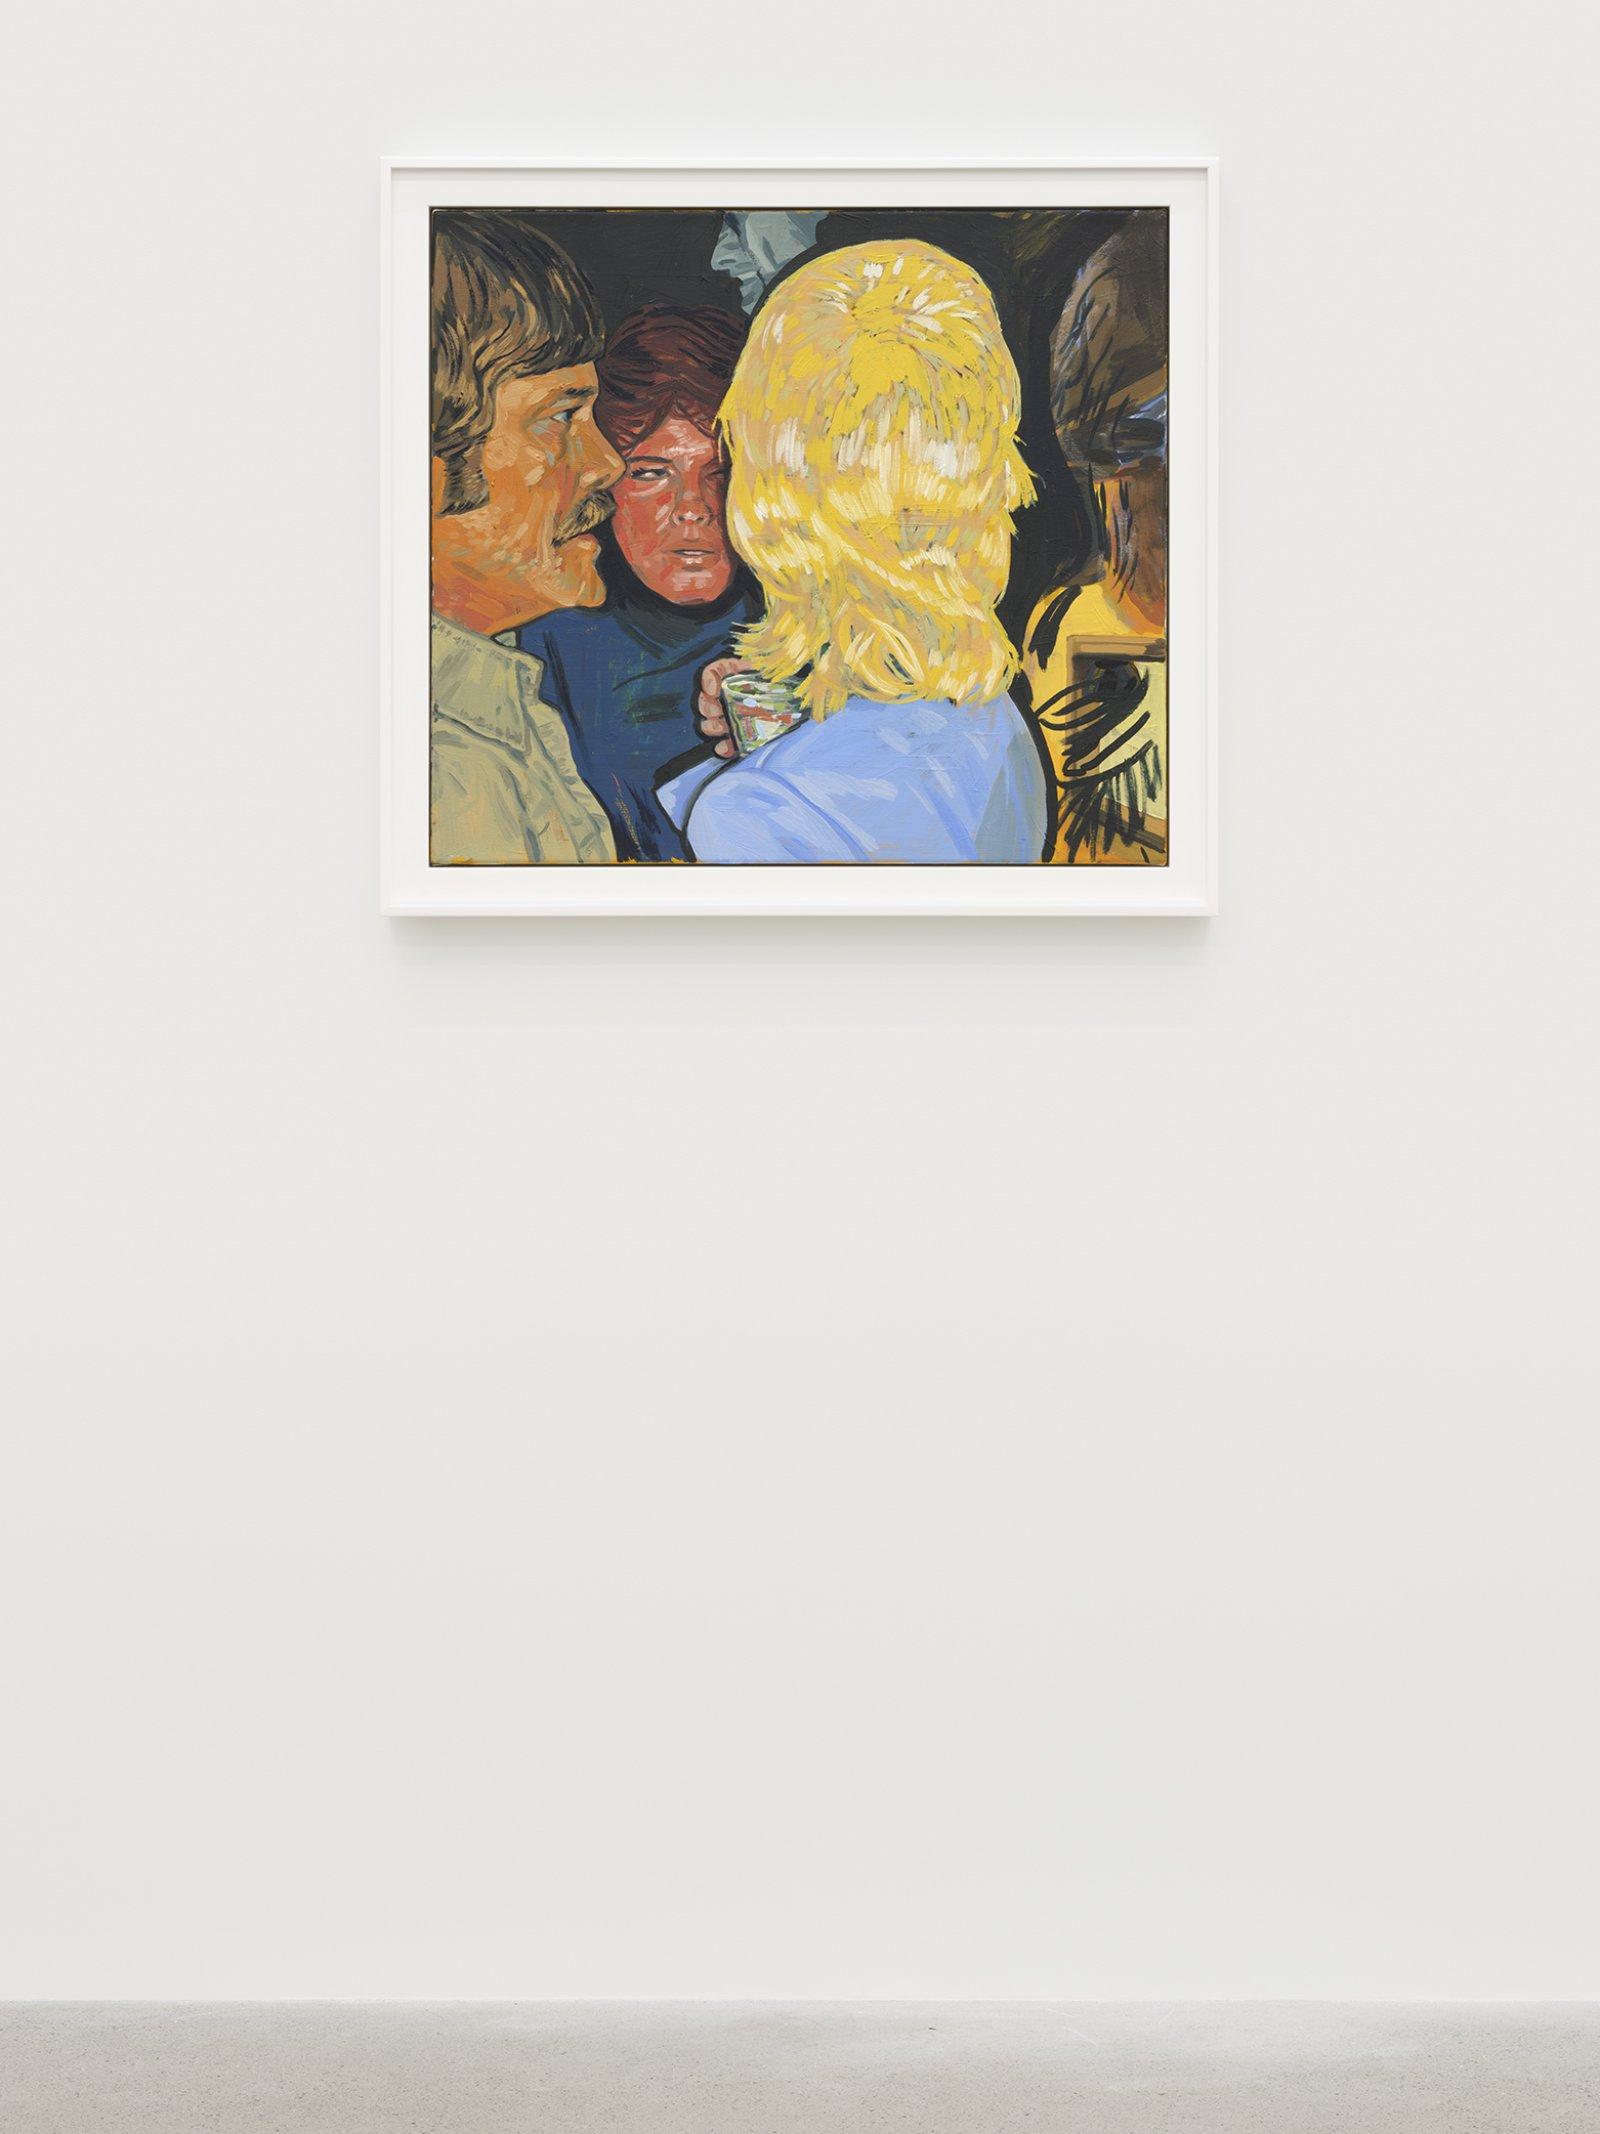 Damian Moppett, Small Party, 2020, oil on canvas, 30 x 33 in. (76 x 84 cm) by Damian Moppett